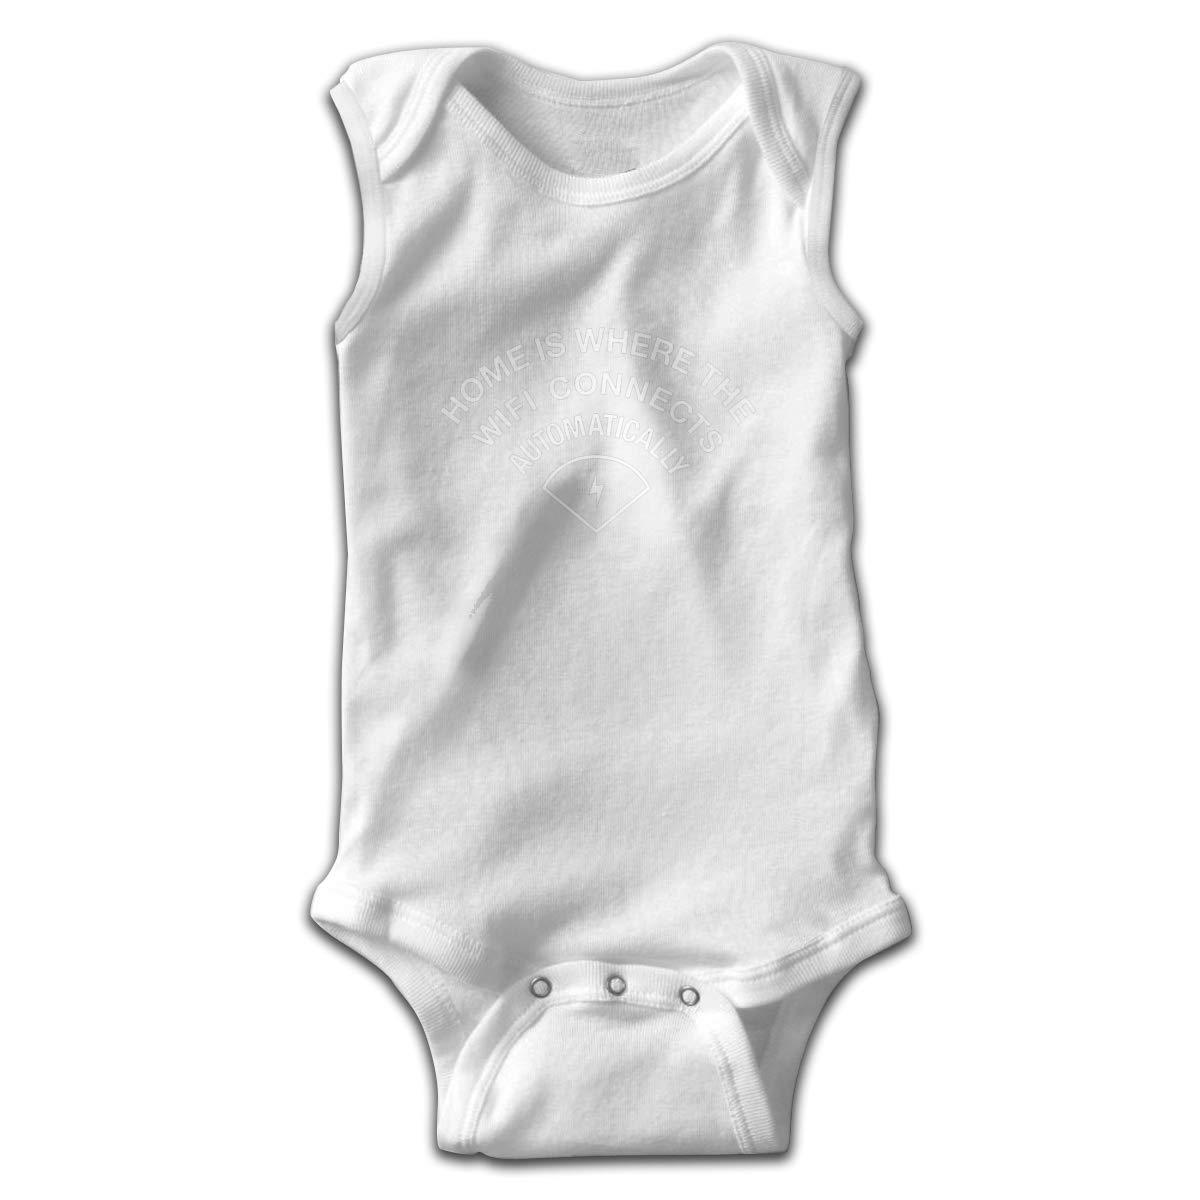 Dunpaiaa Home is WiFi Connects Smalls Baby Onesie,Infant Bodysuit Black